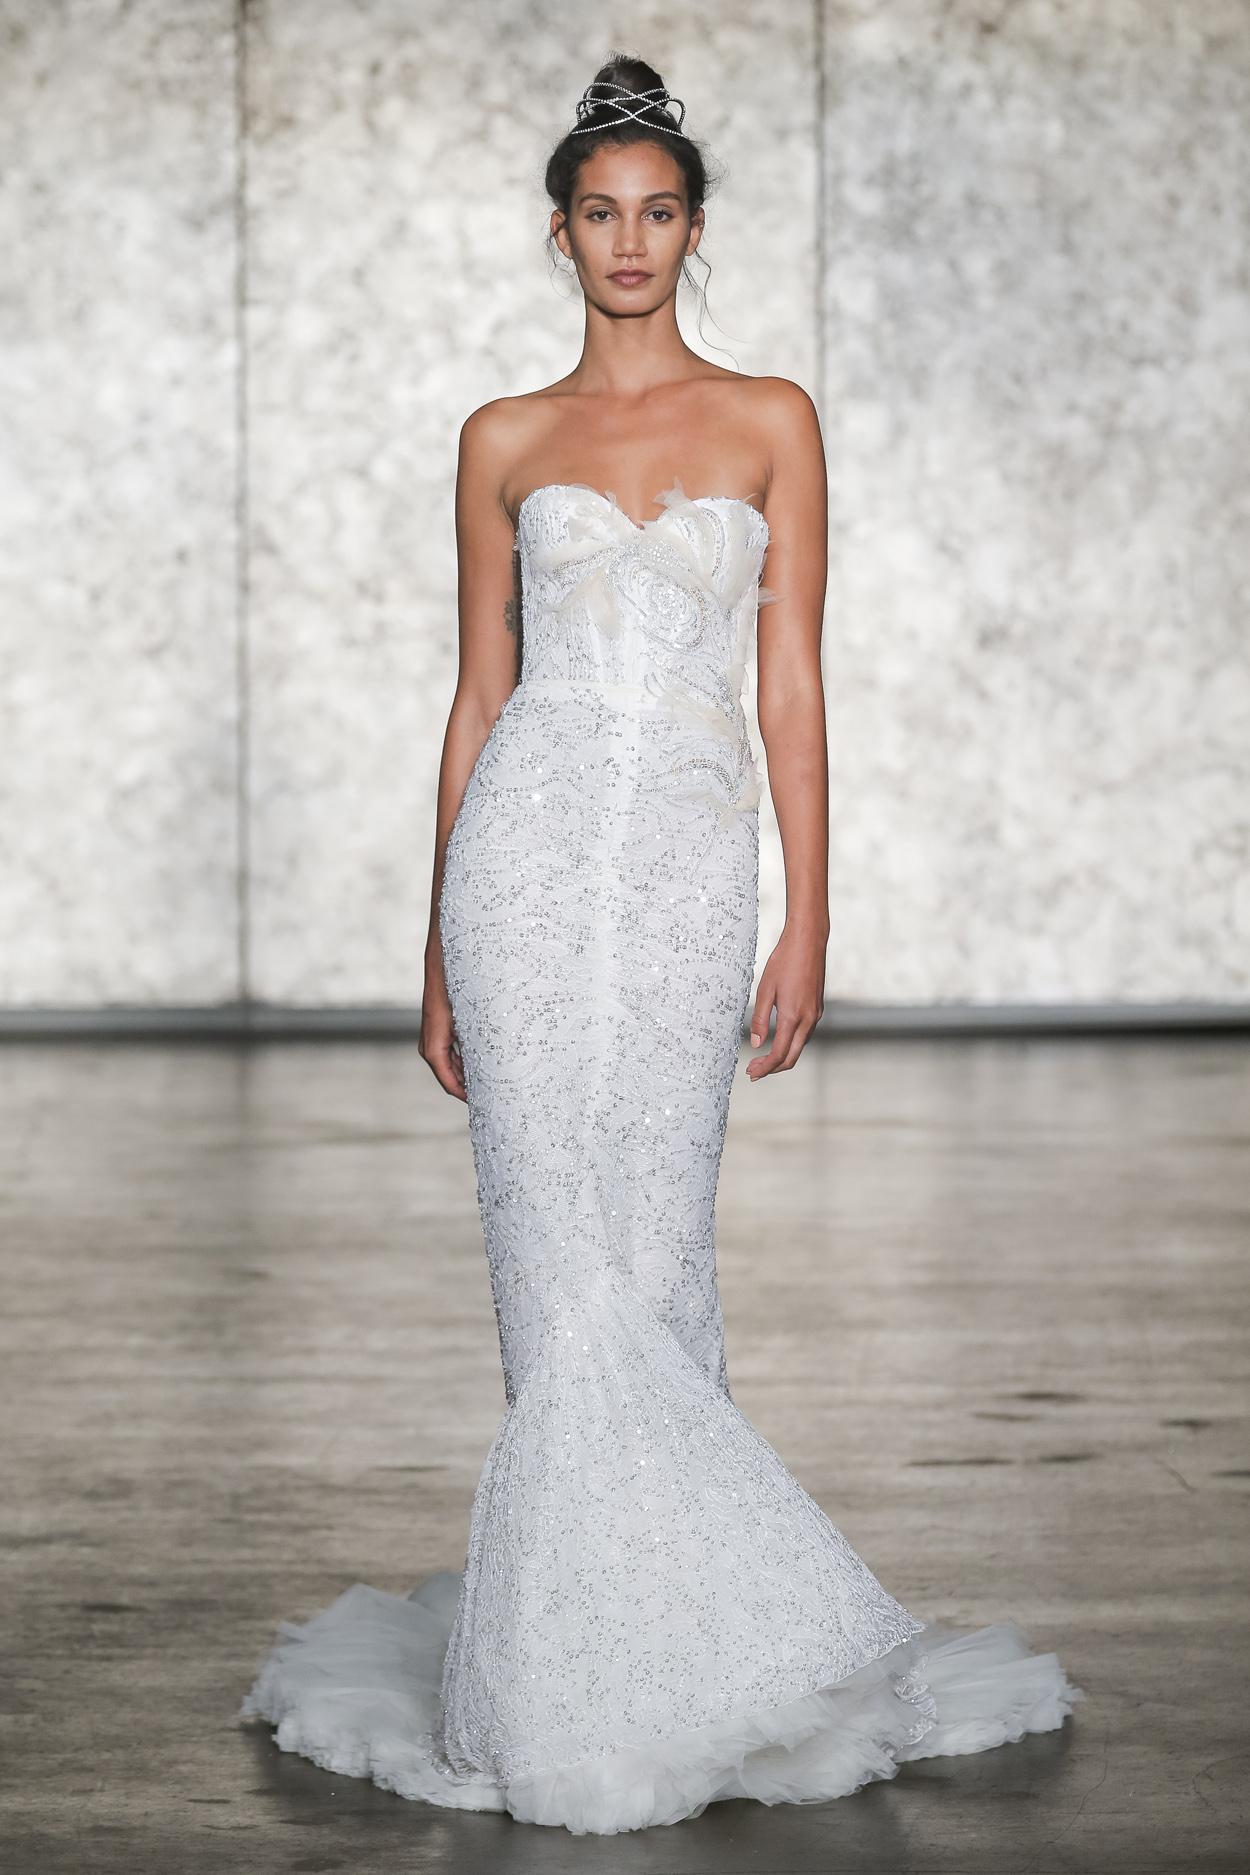 Sweetheart neckline wedding dress Inbal Dror bridal gown